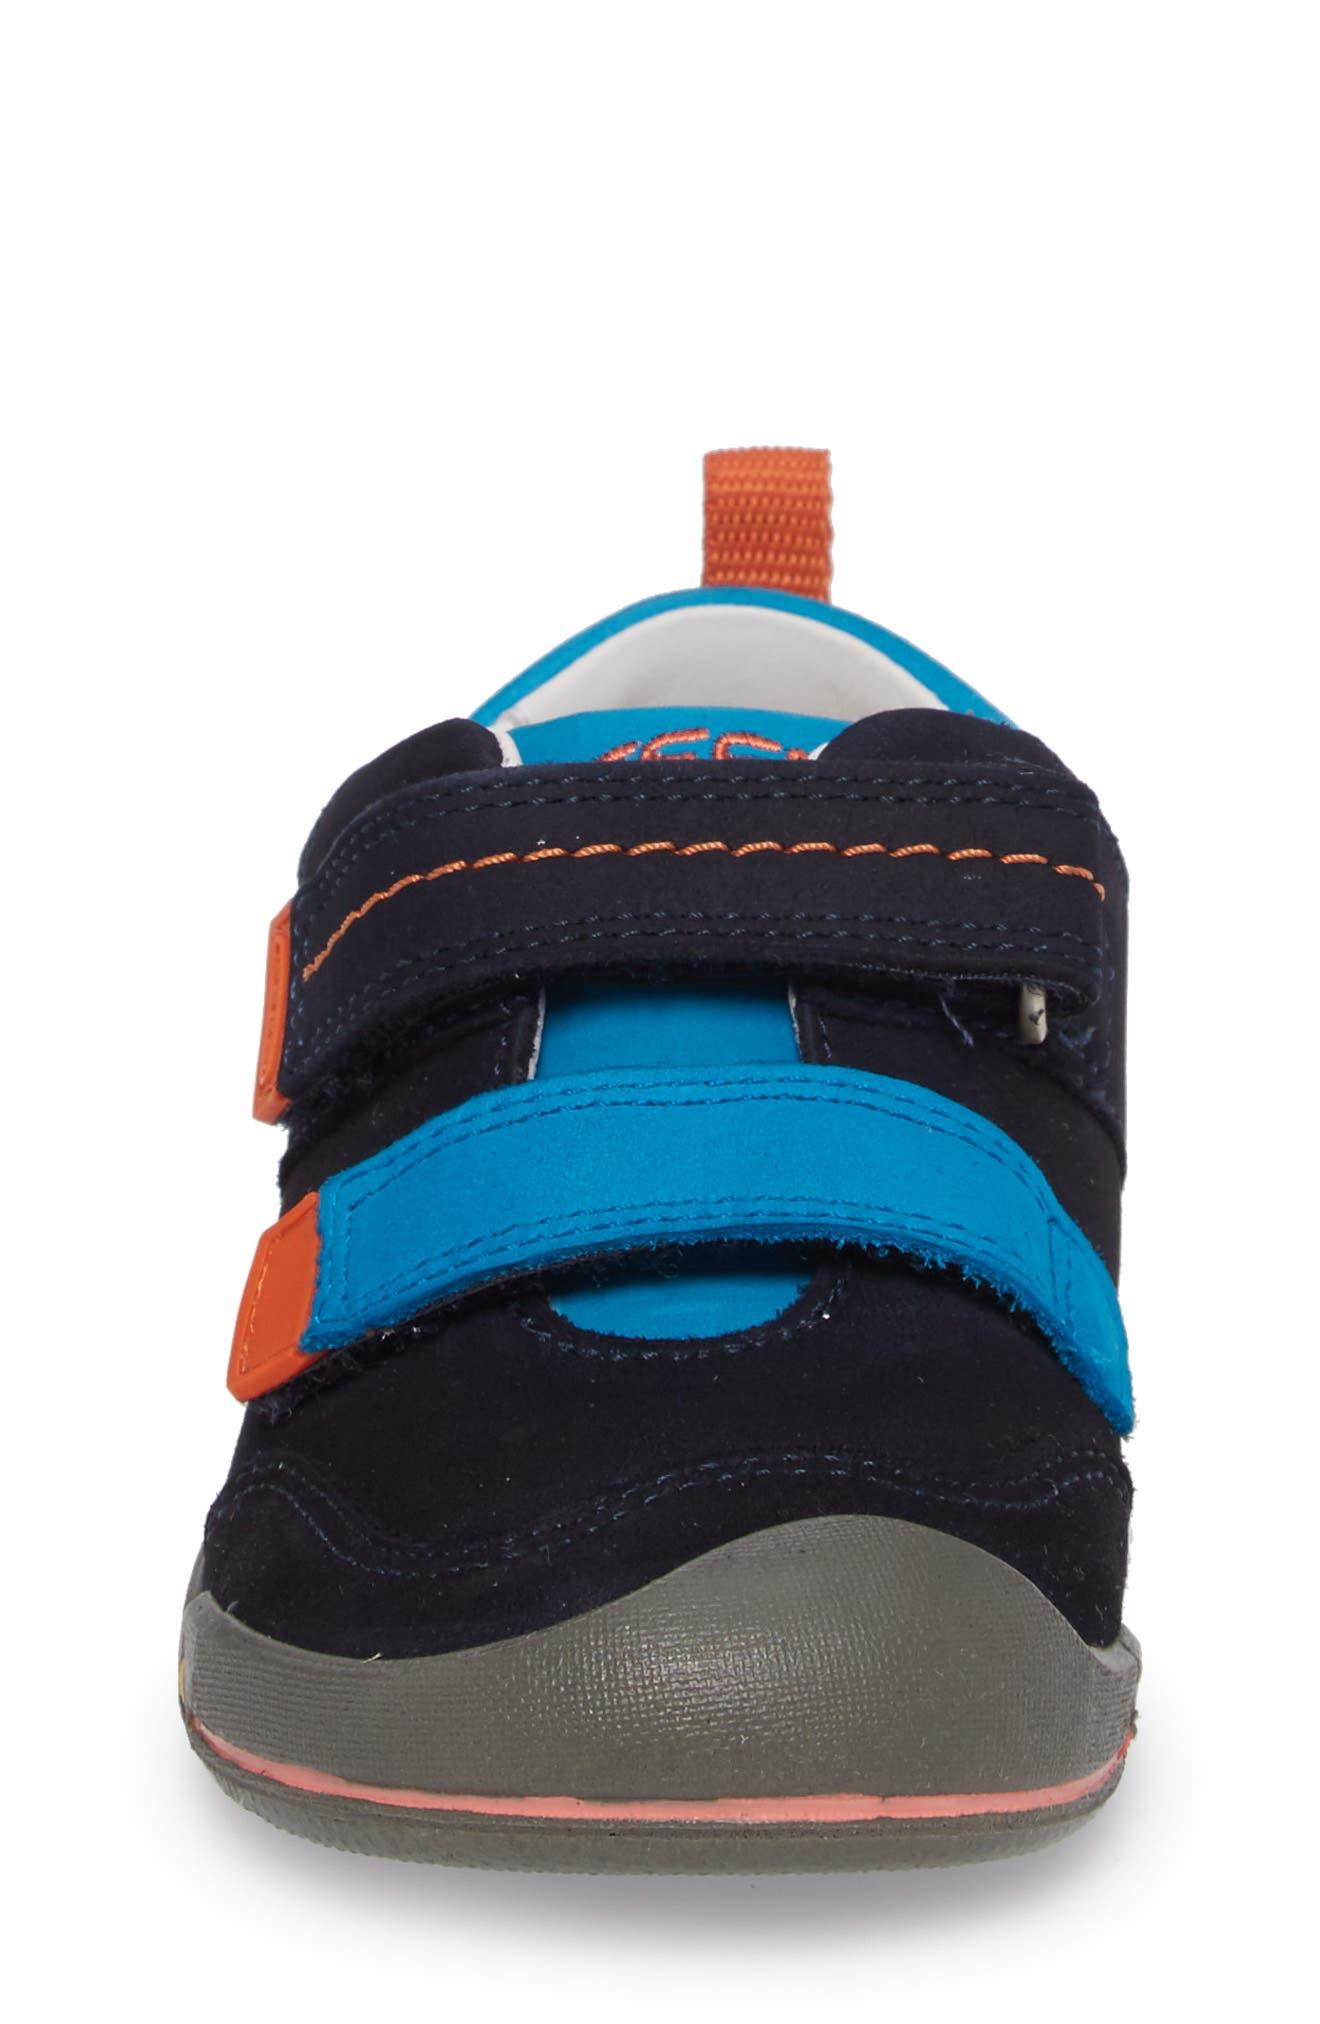 Sprout Double Strap Sneaker,                             Alternate thumbnail 4, color,                             DRESS BLUES/ KOI